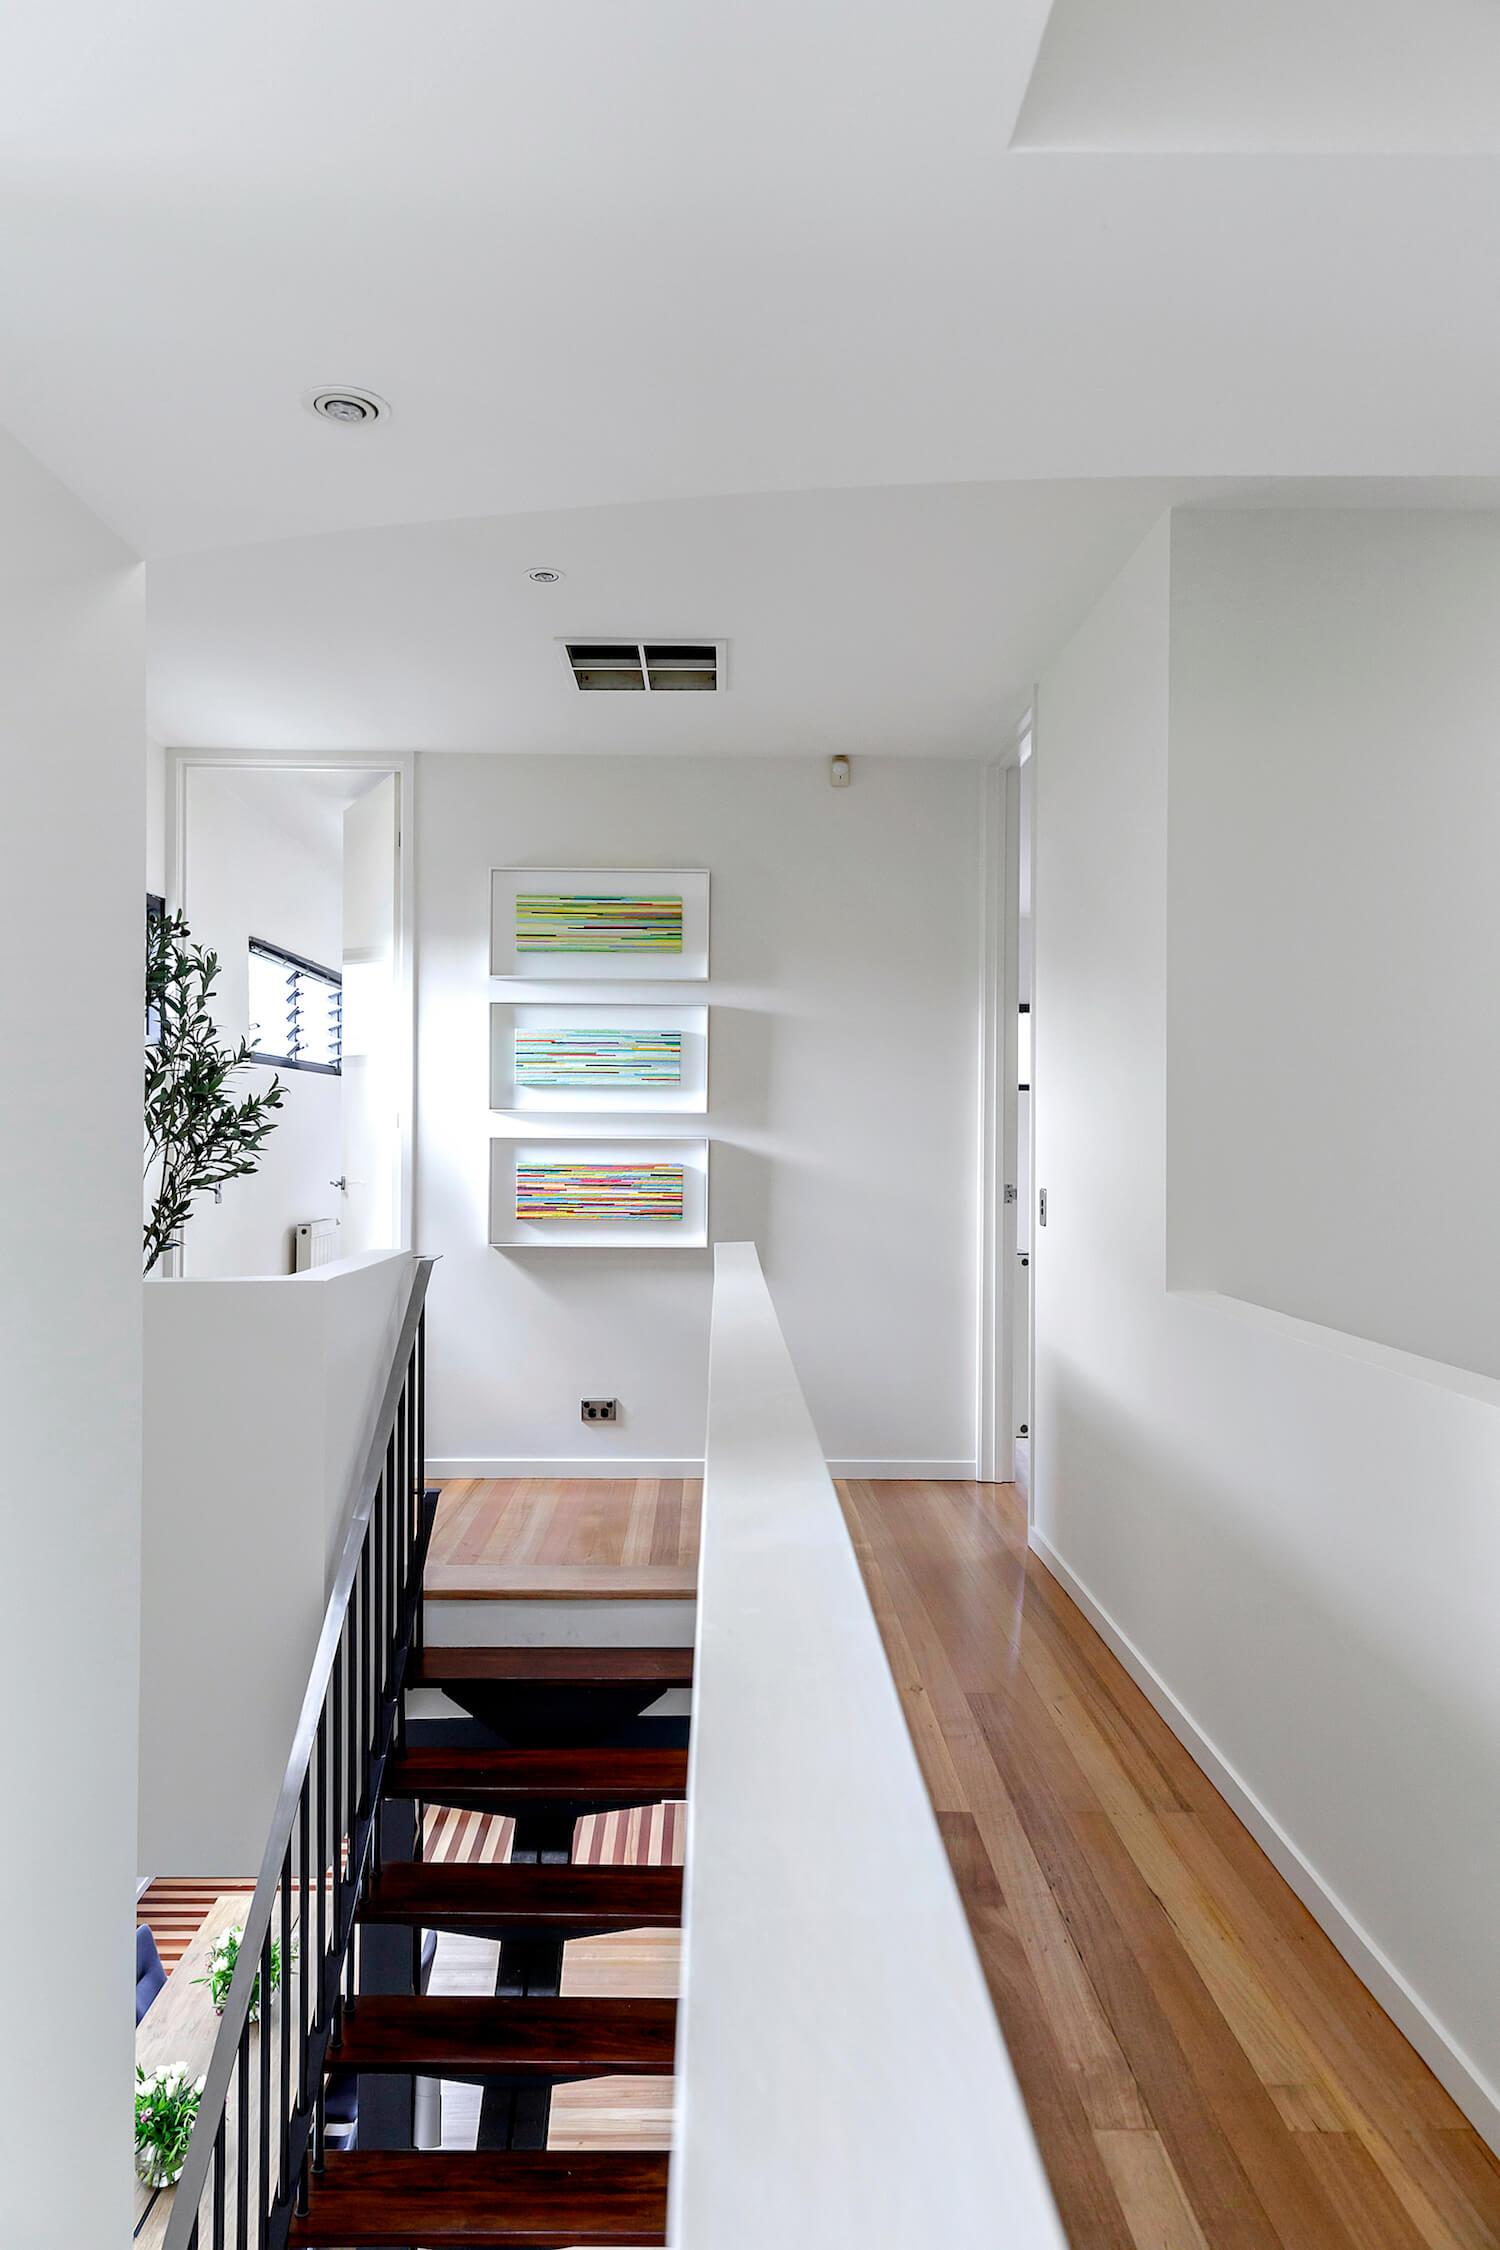 est living open house 423 napier street fitzroy 5